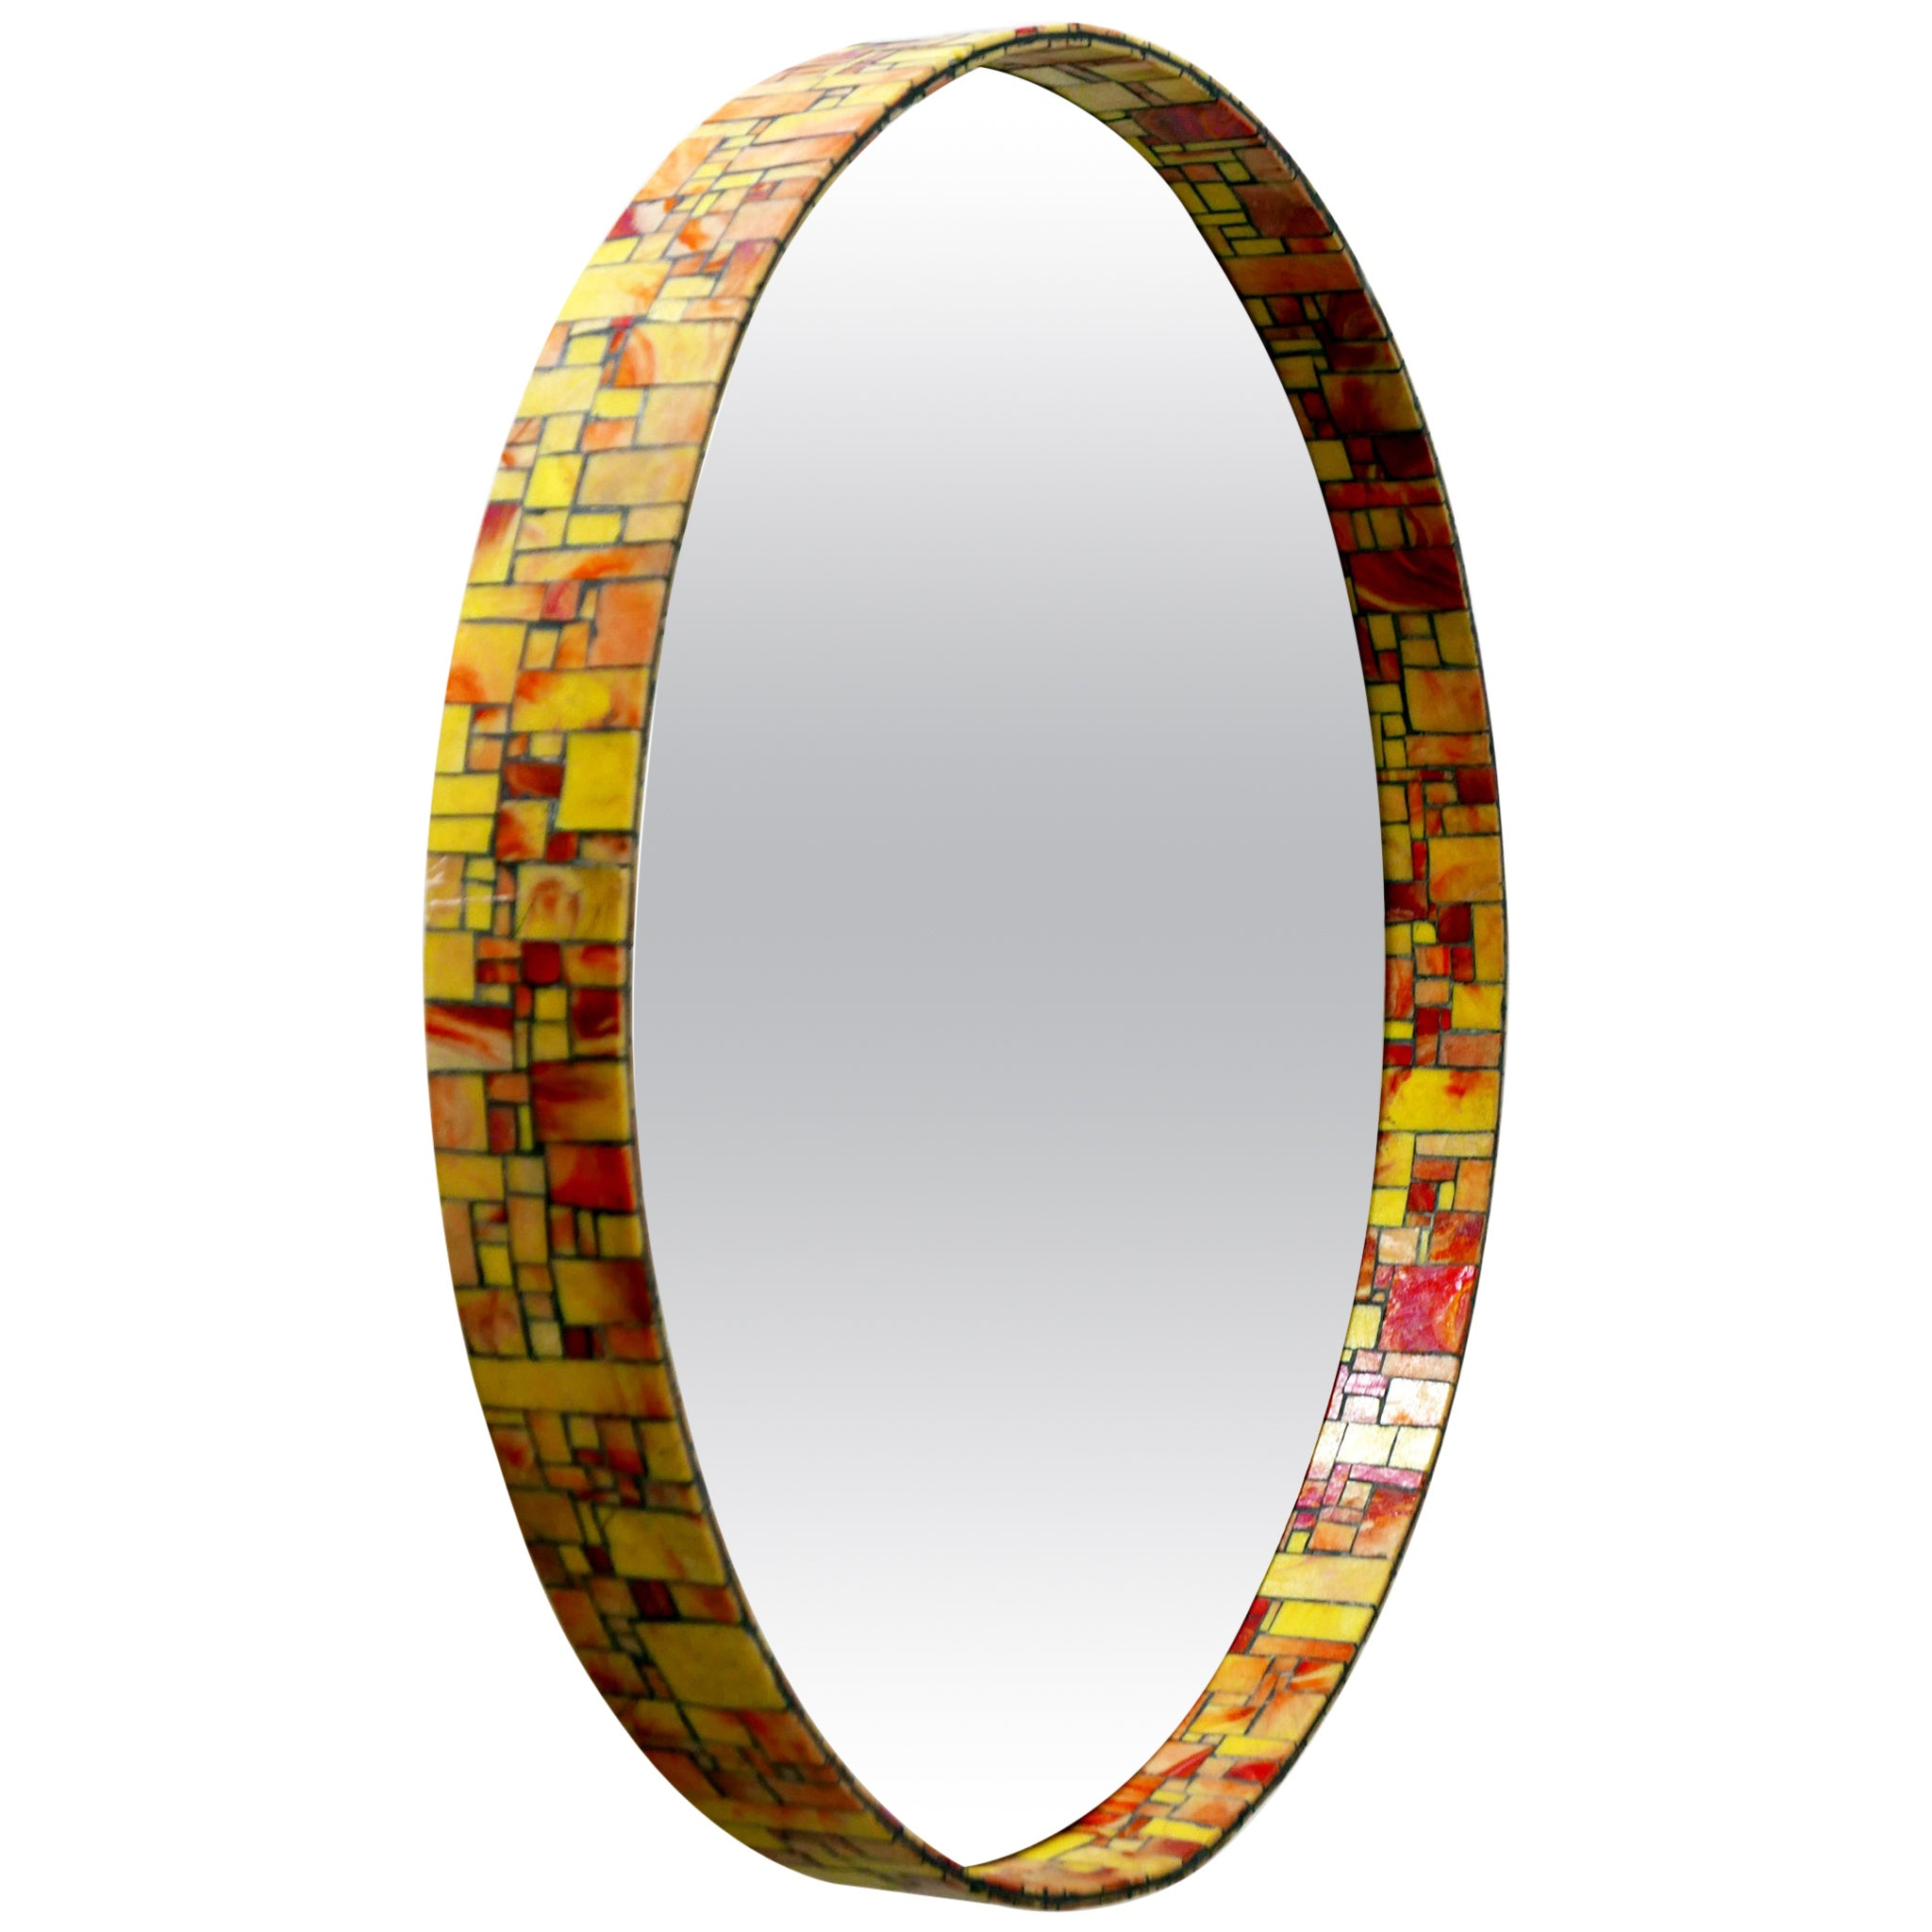 Exceptional Mid-Century Modern Mosaic Framed Circular Wall Mirror, Italy, 1960s